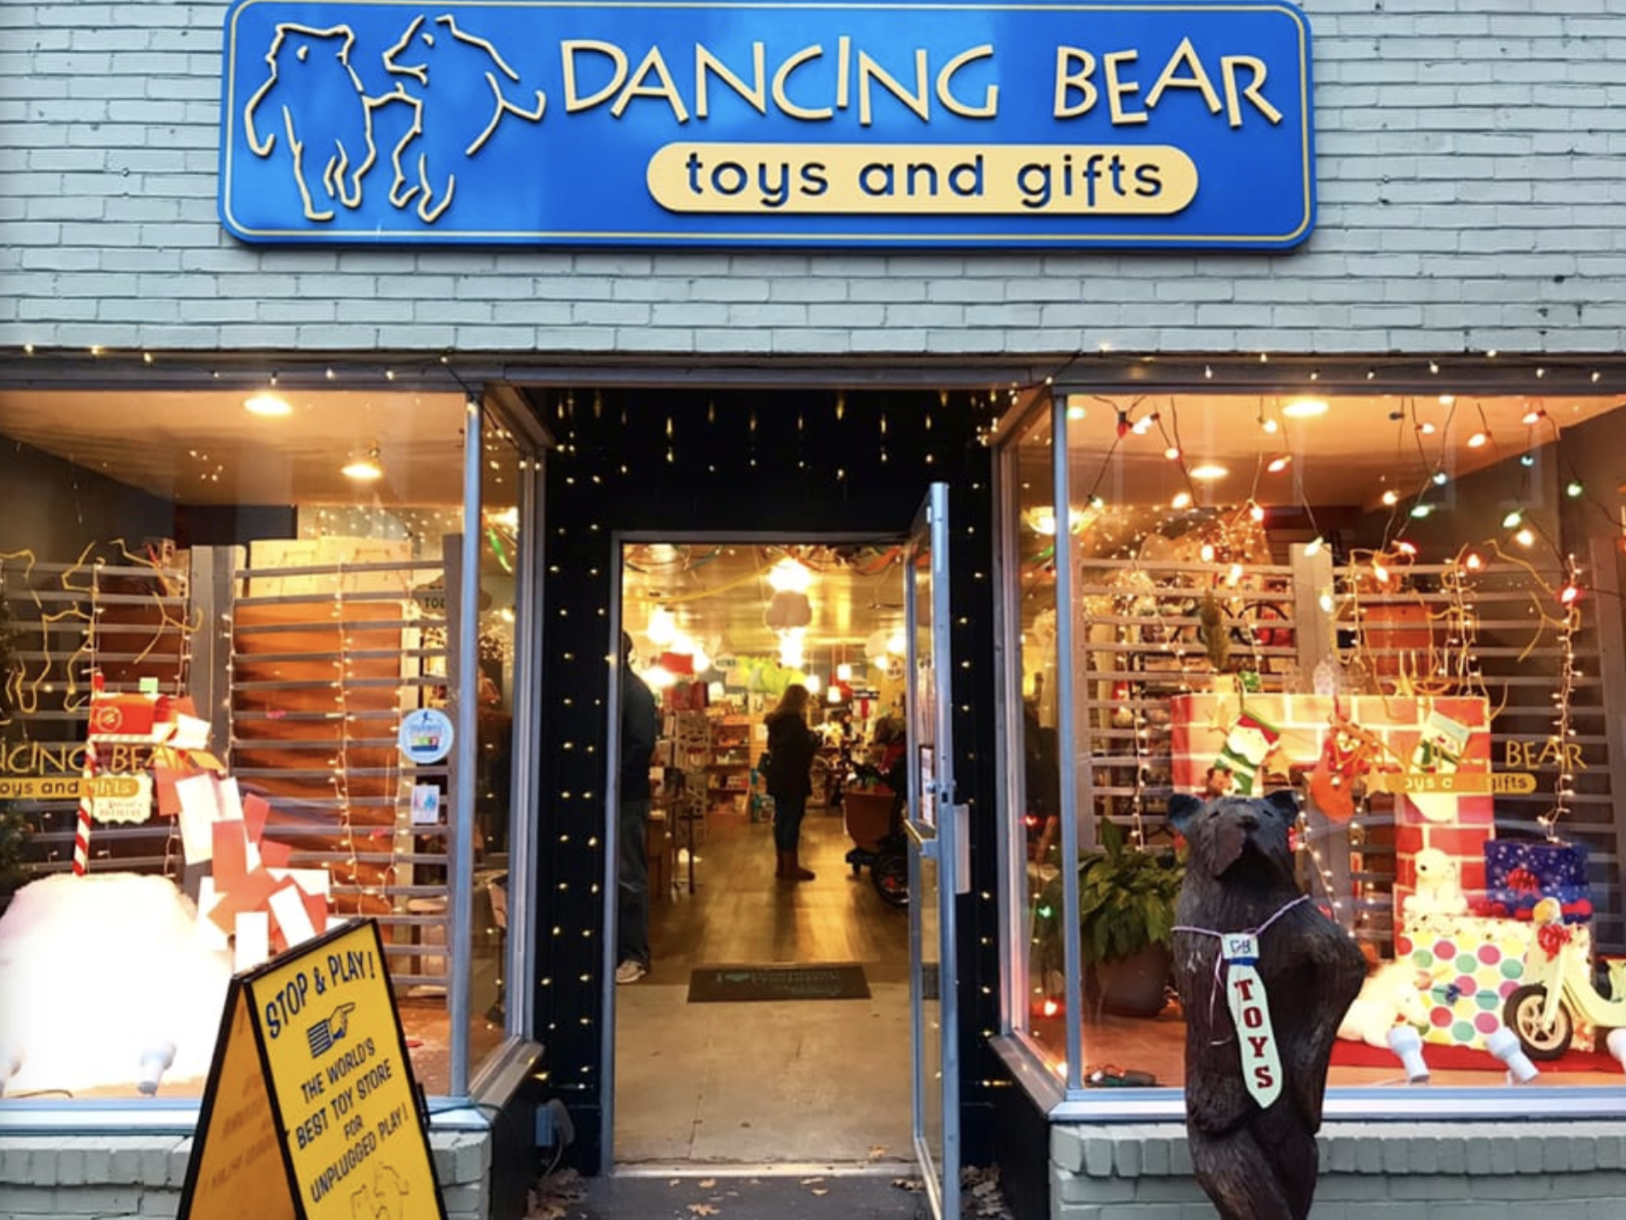 Image via Dancing Bears Toys and Gifts